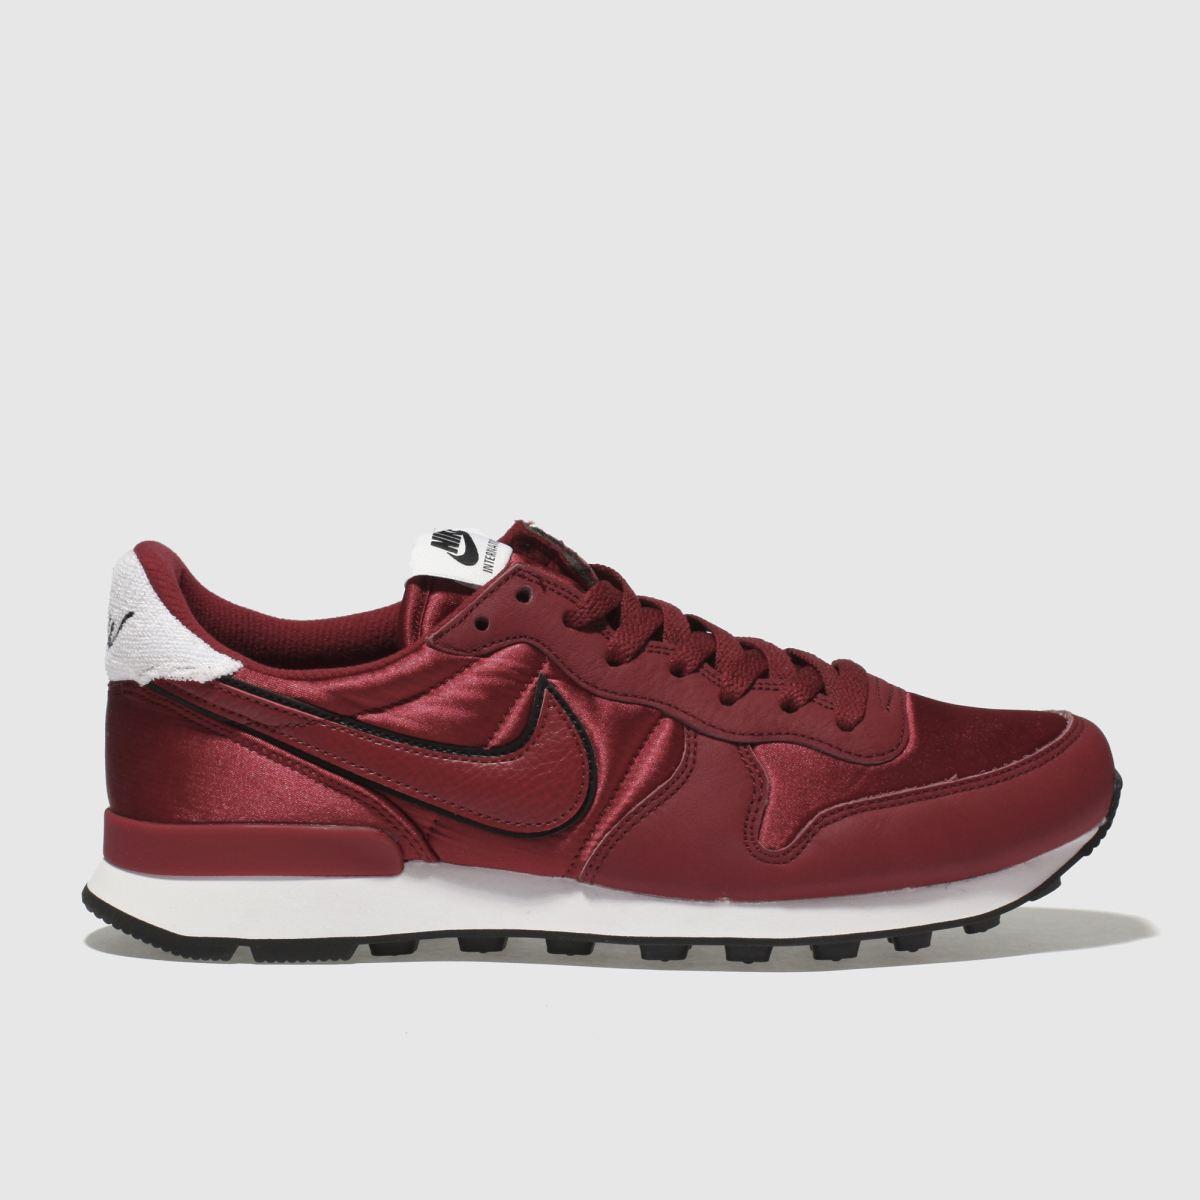 Nike Red Internationalist Heat Trainers